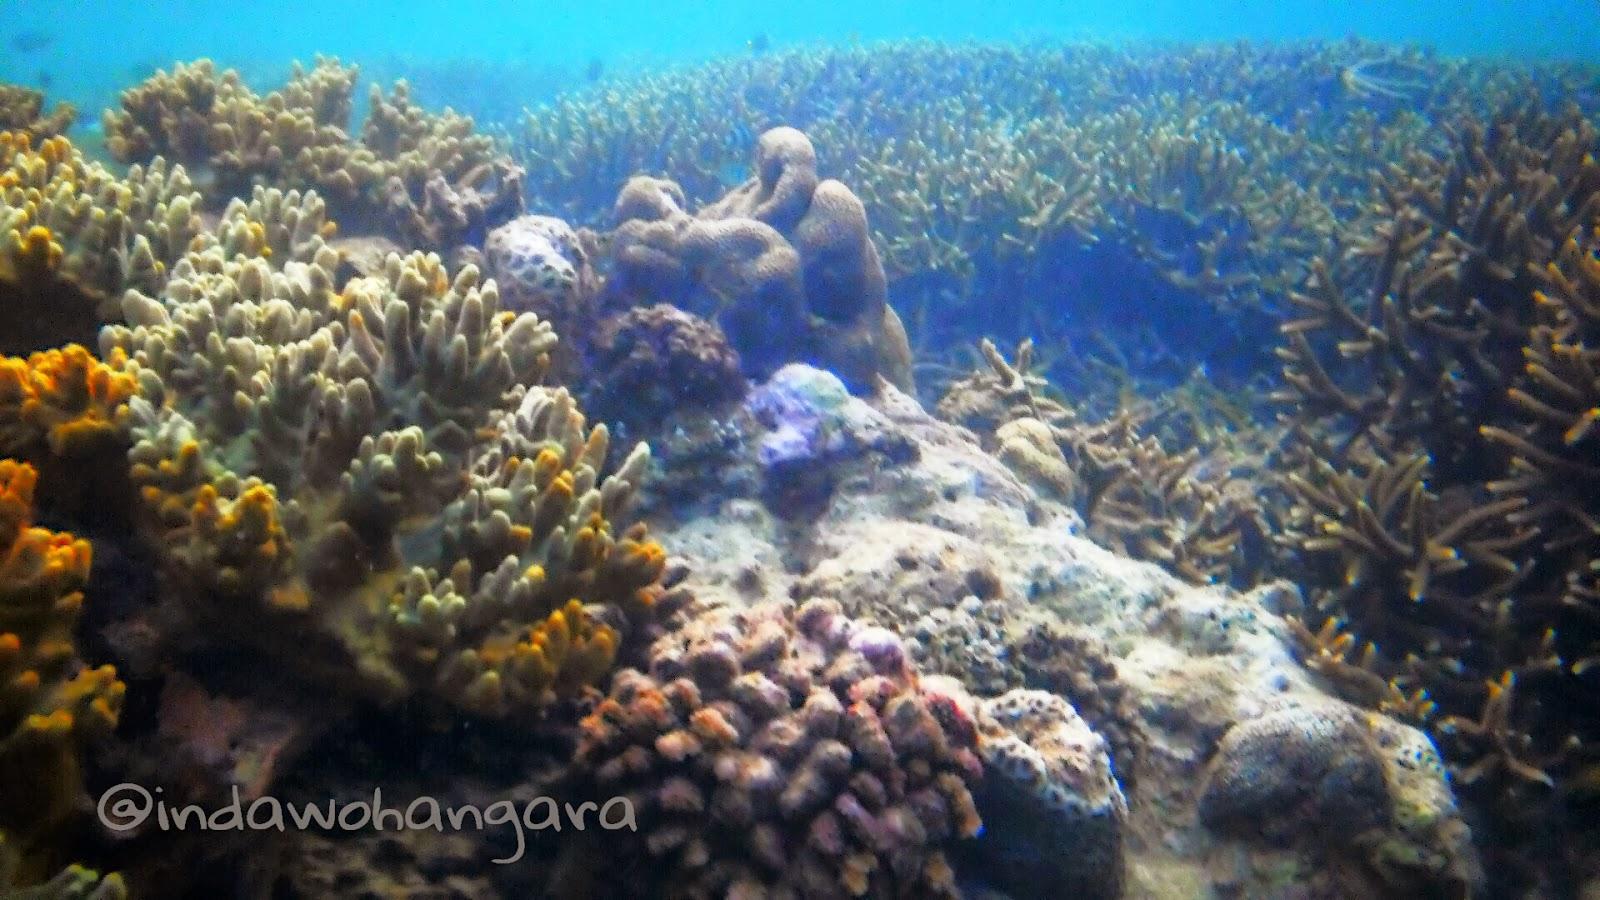 Inda Tapaleuk Bawah Laut Kupang 2 Terumbu Karang Ikan Cantik